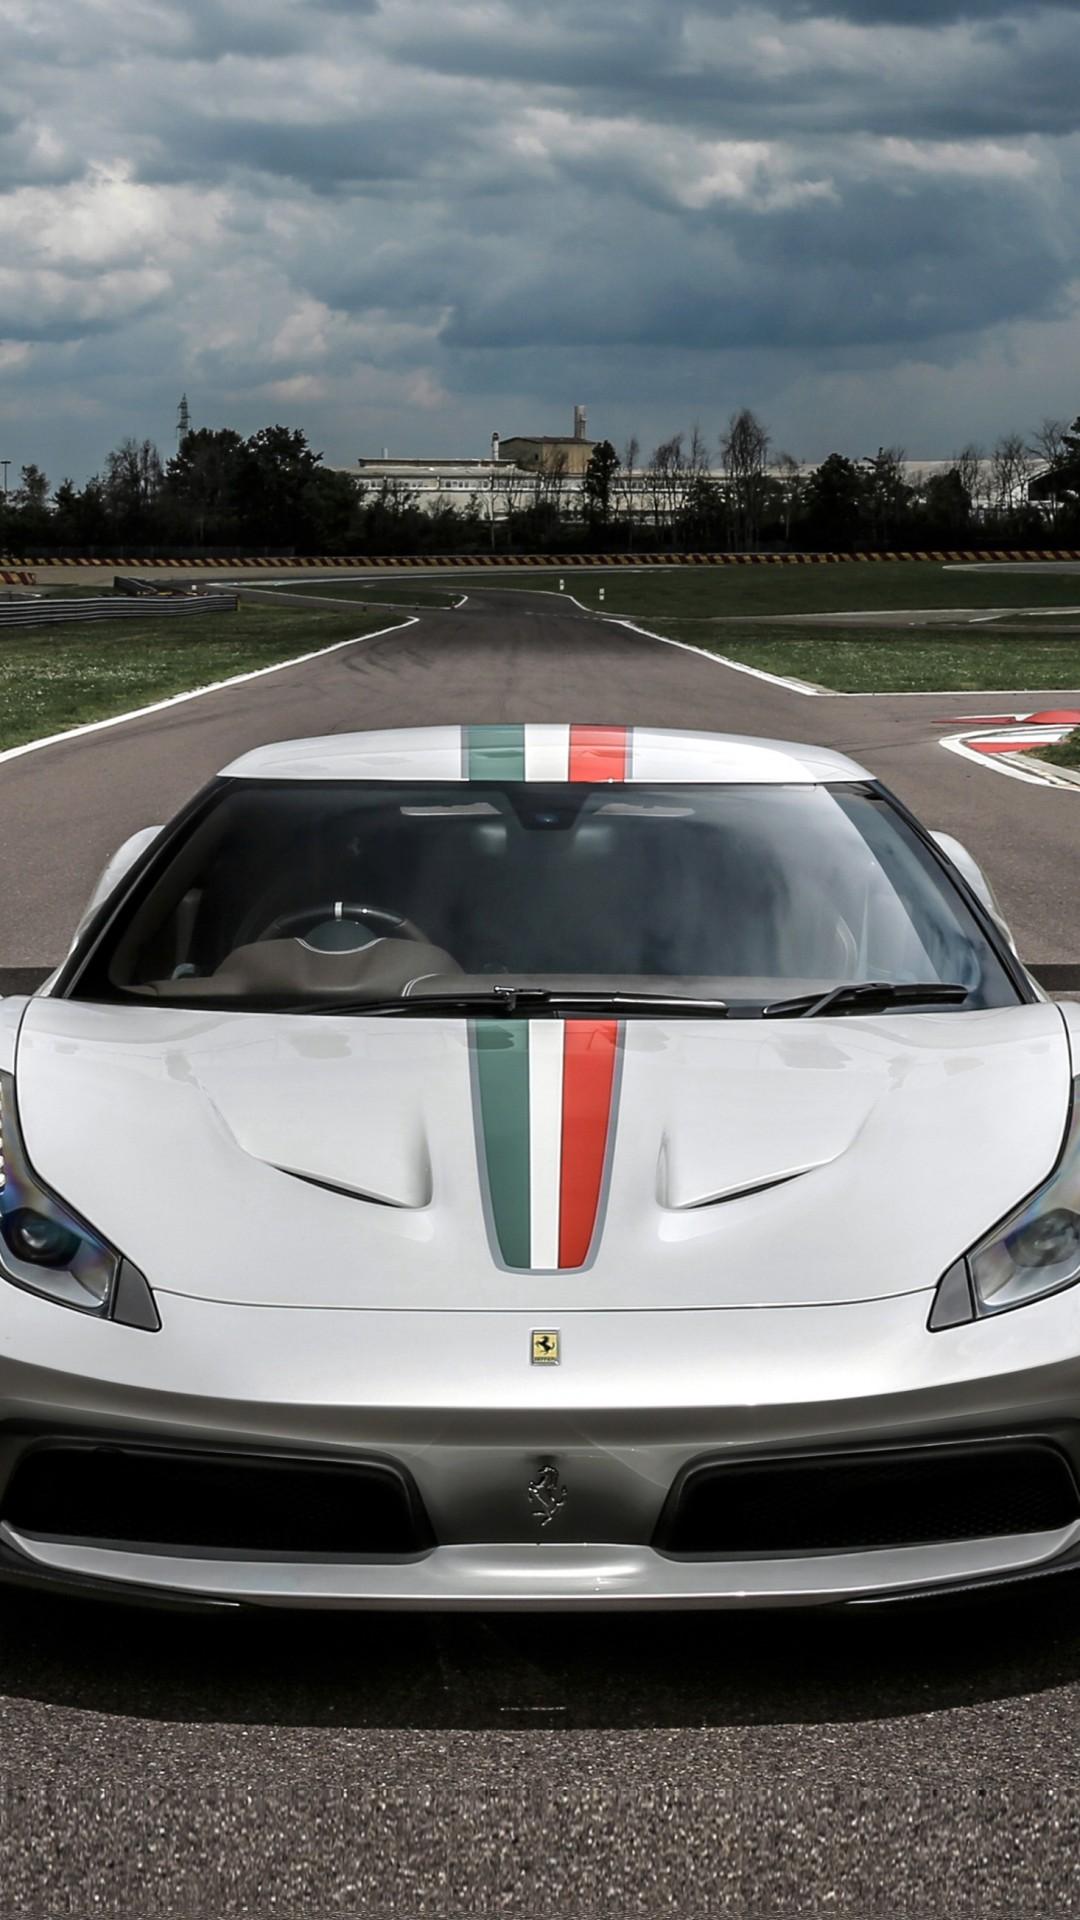 Ferrari 458 White >> Wallpaper Ferrari 458 MM Speciale, sport car, white, Cars & Bikes #10990